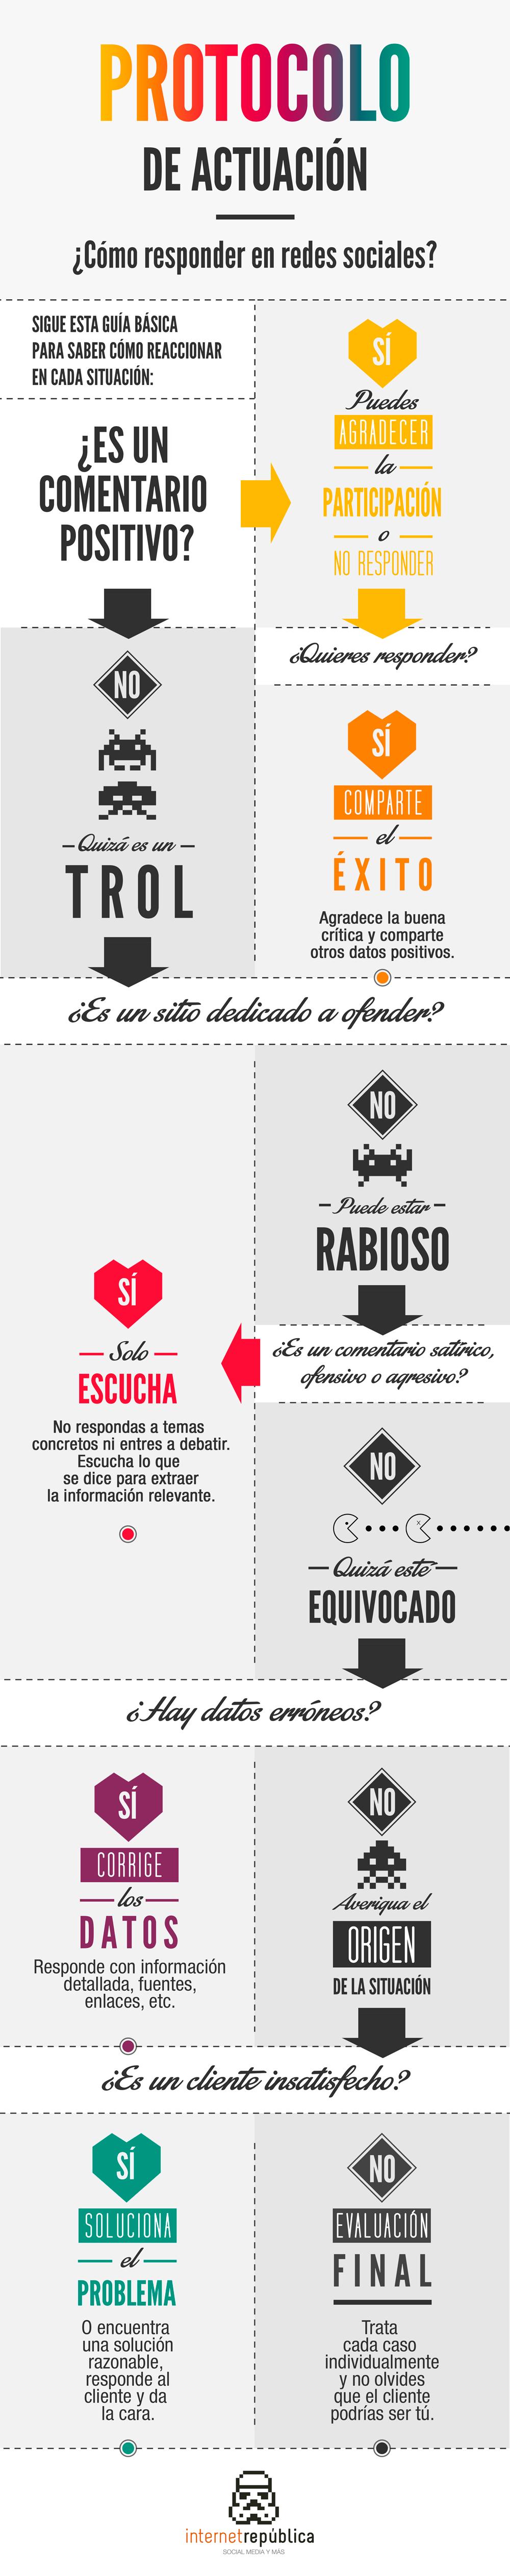 Protocolo-redes-sociales-infografia